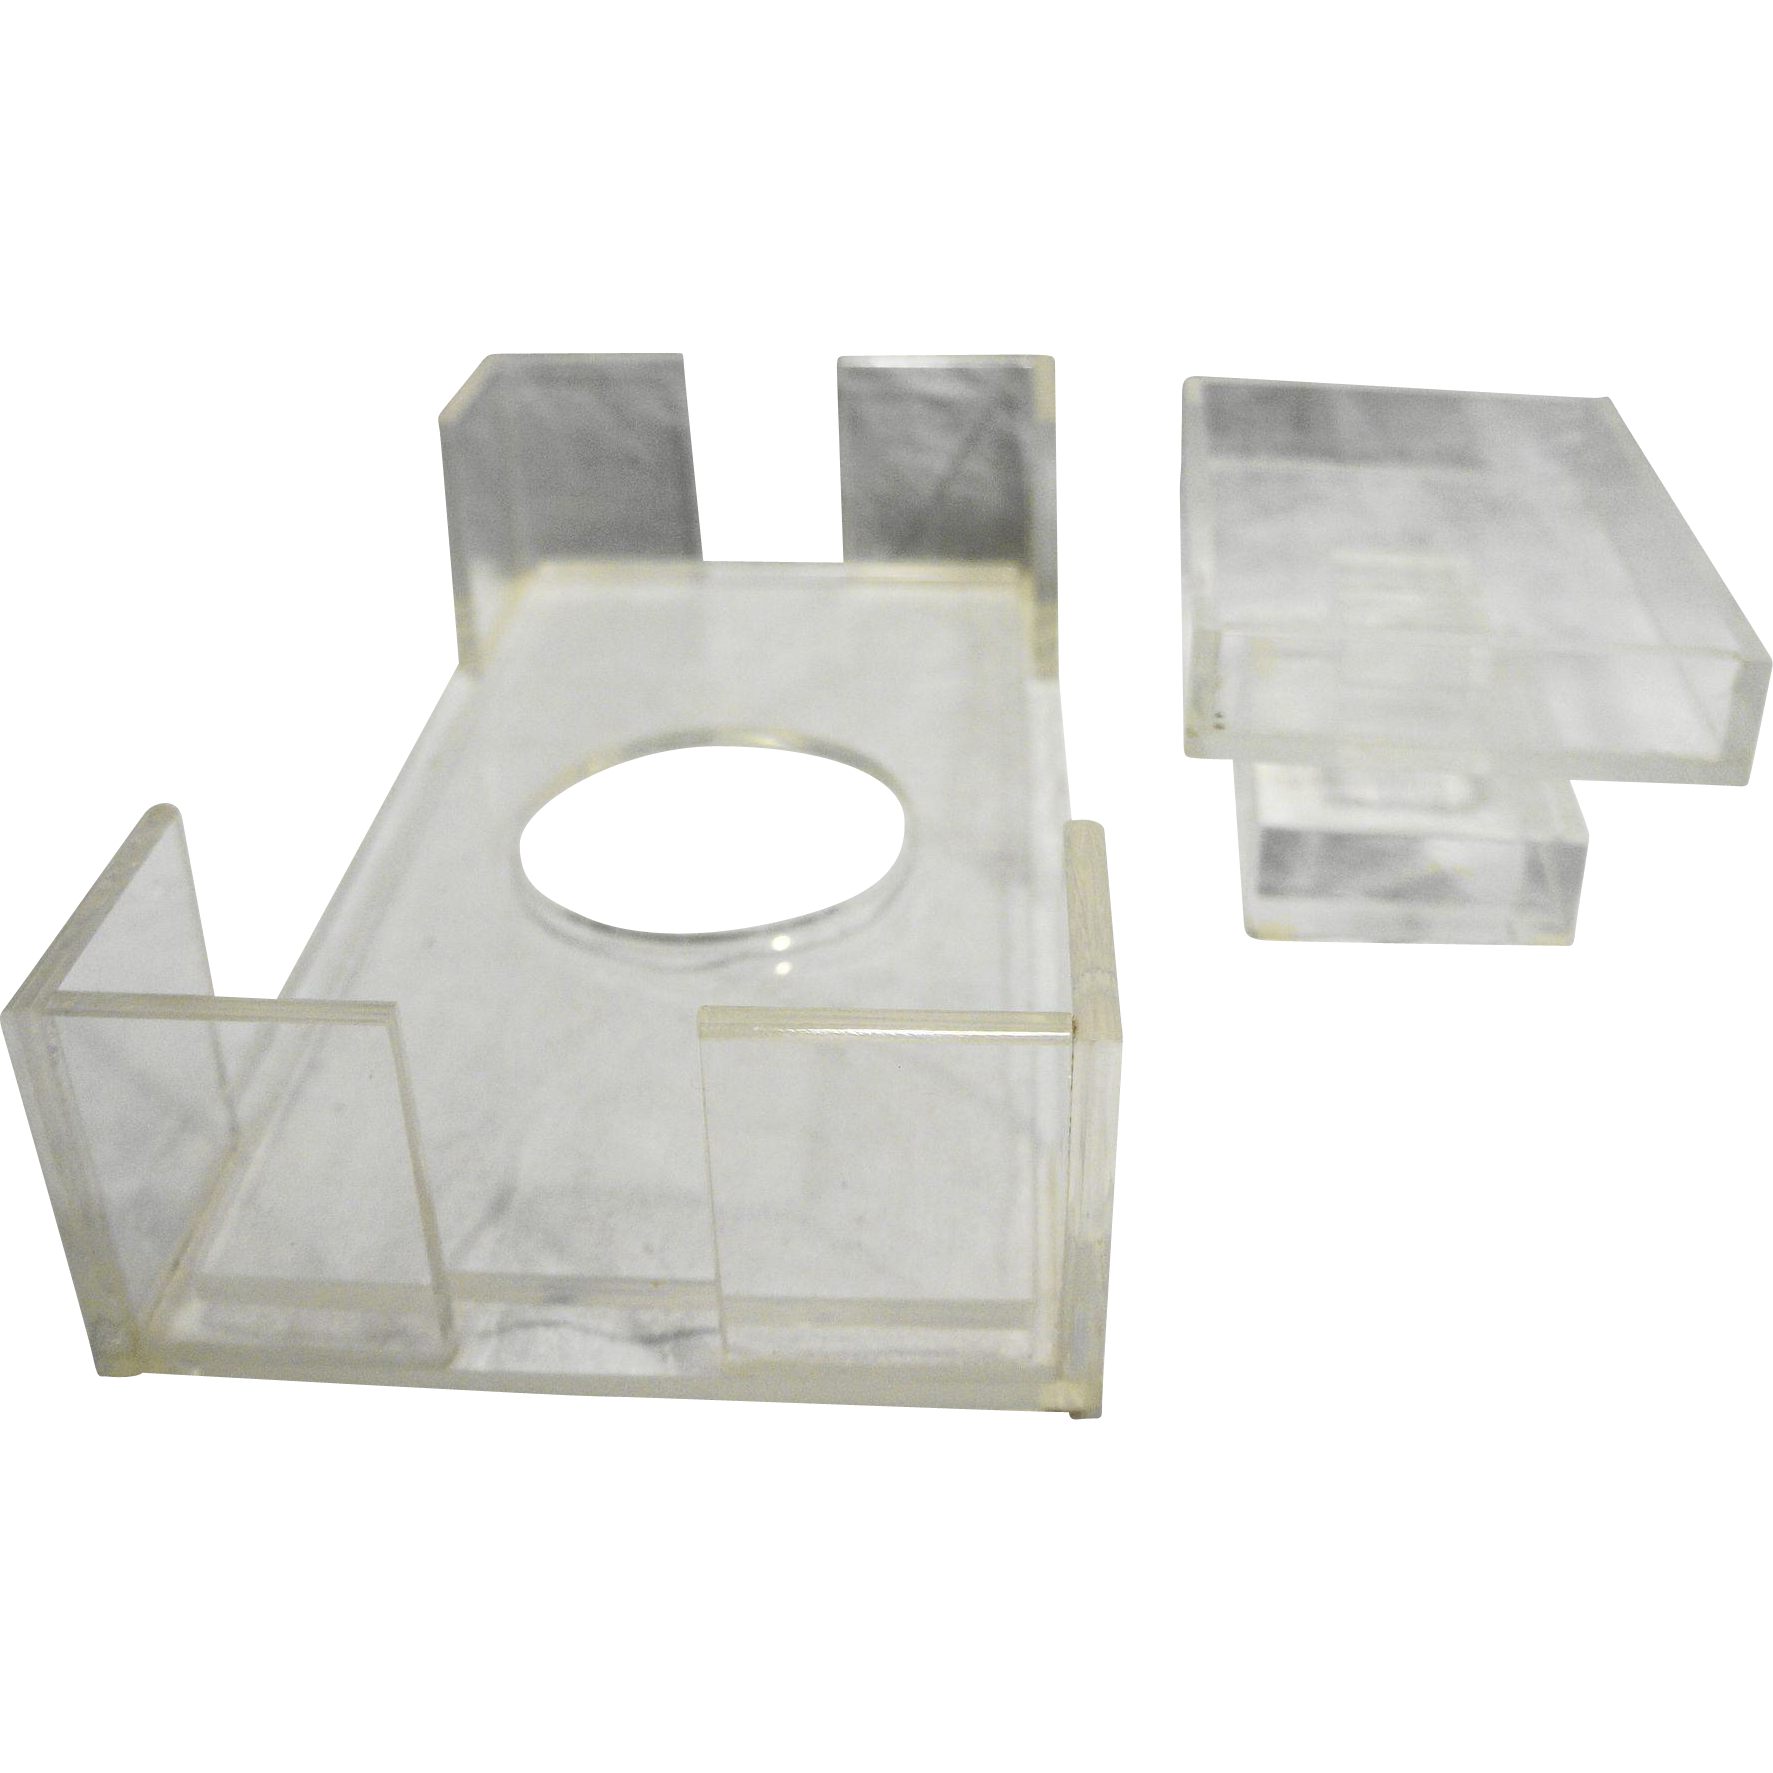 Clear Lucite Acrylic Plastic Tissue Box Holder Soap Dish Bathroom Set 1970s